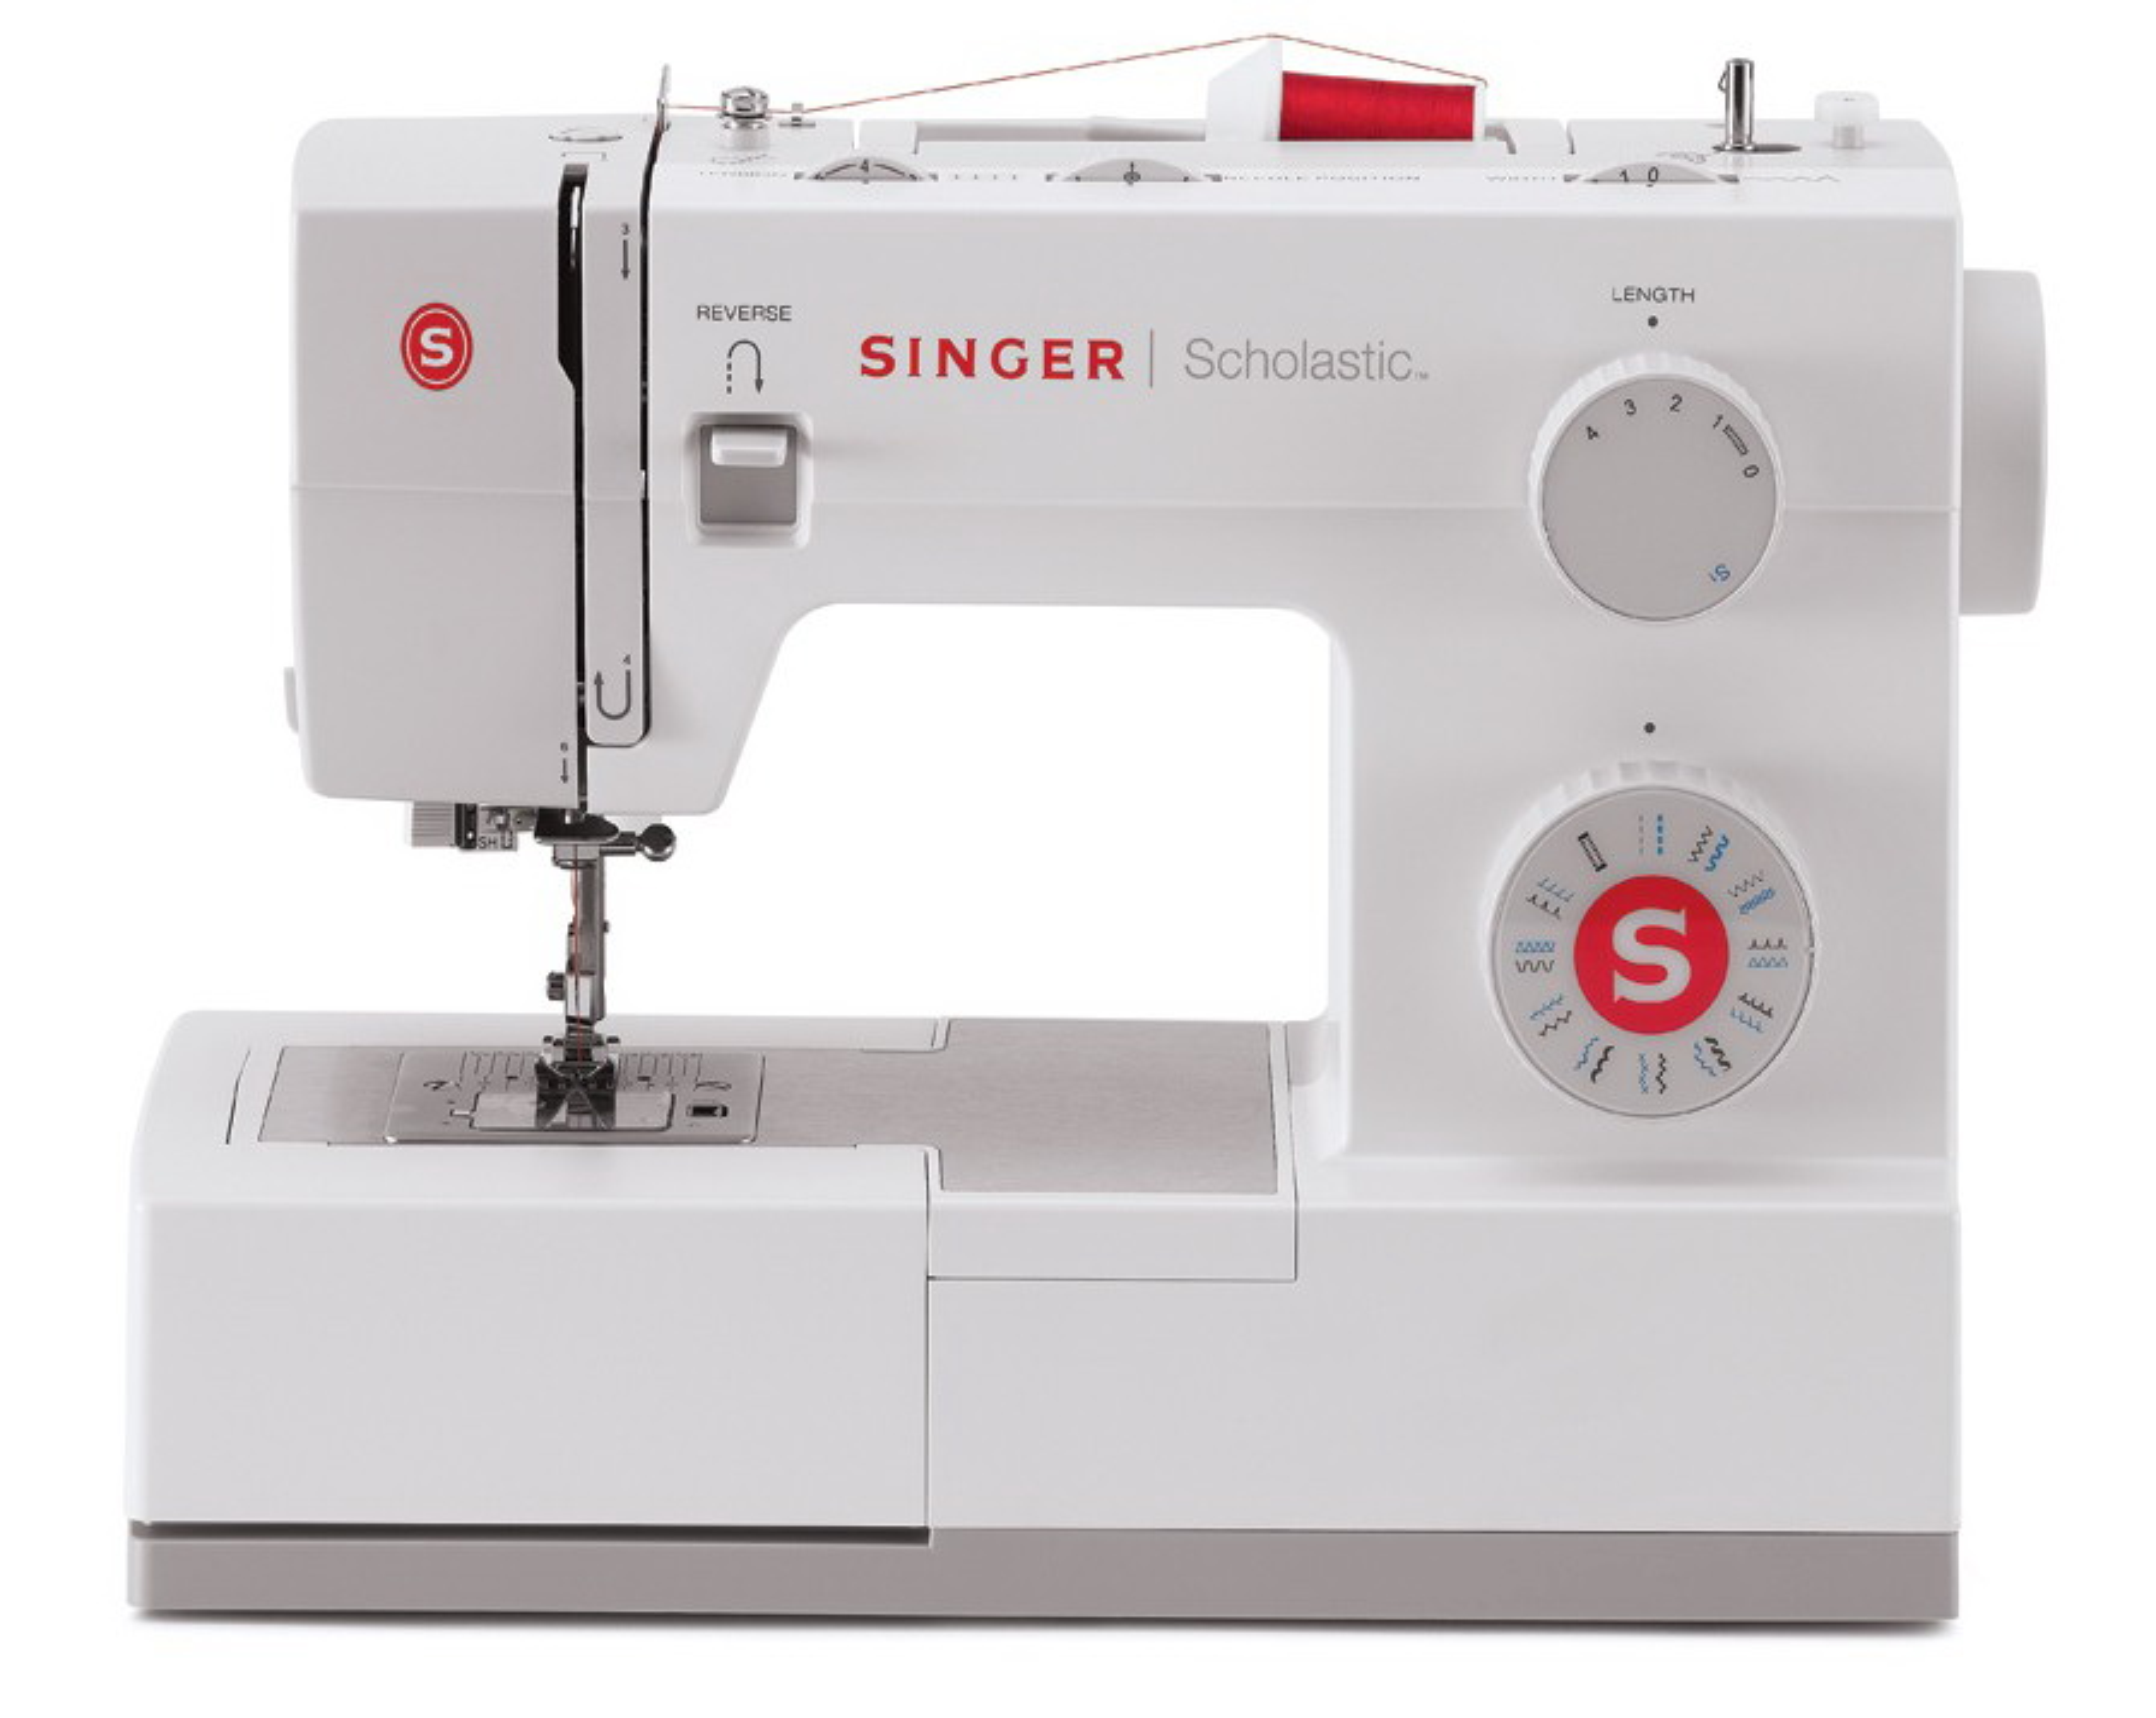 Singer 40 Scholastic Heavy Duty Sewing Machine Inspiration Singer Sewing Machine Heavy Duty